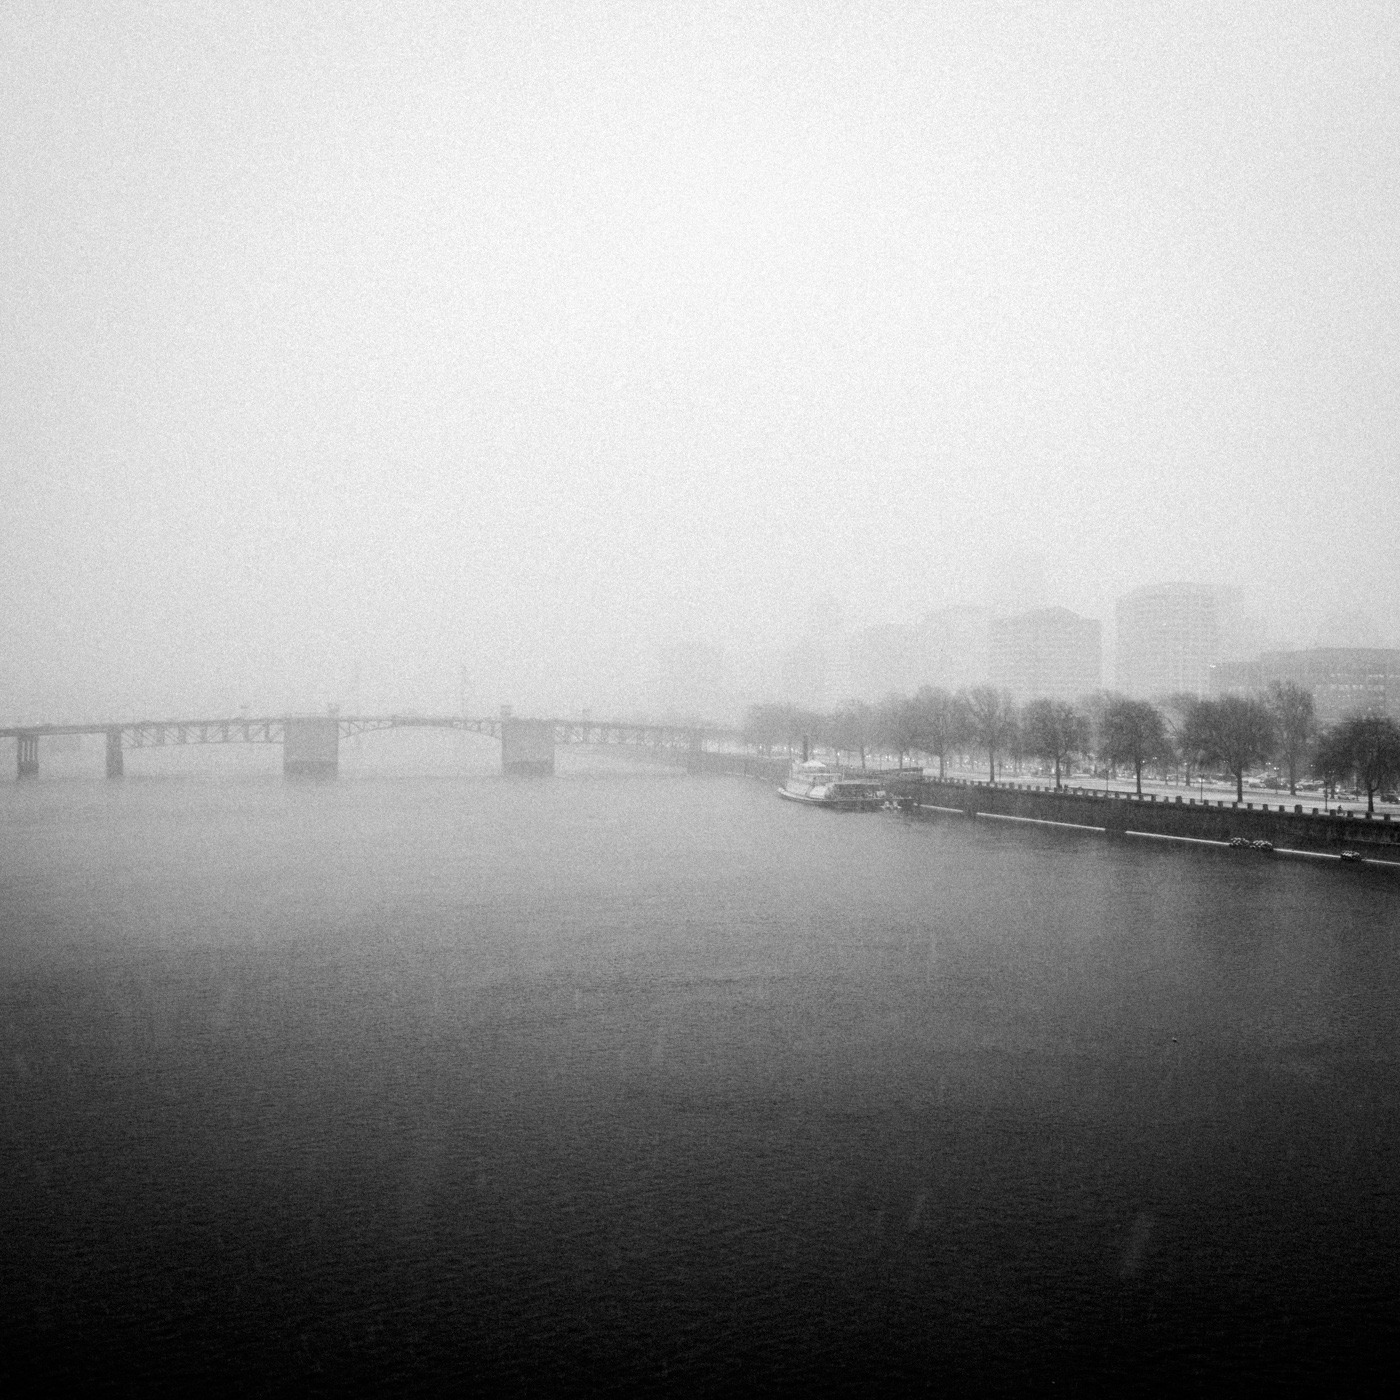 Willamette River from Burnside Bridge during a snowstorm, December 2016